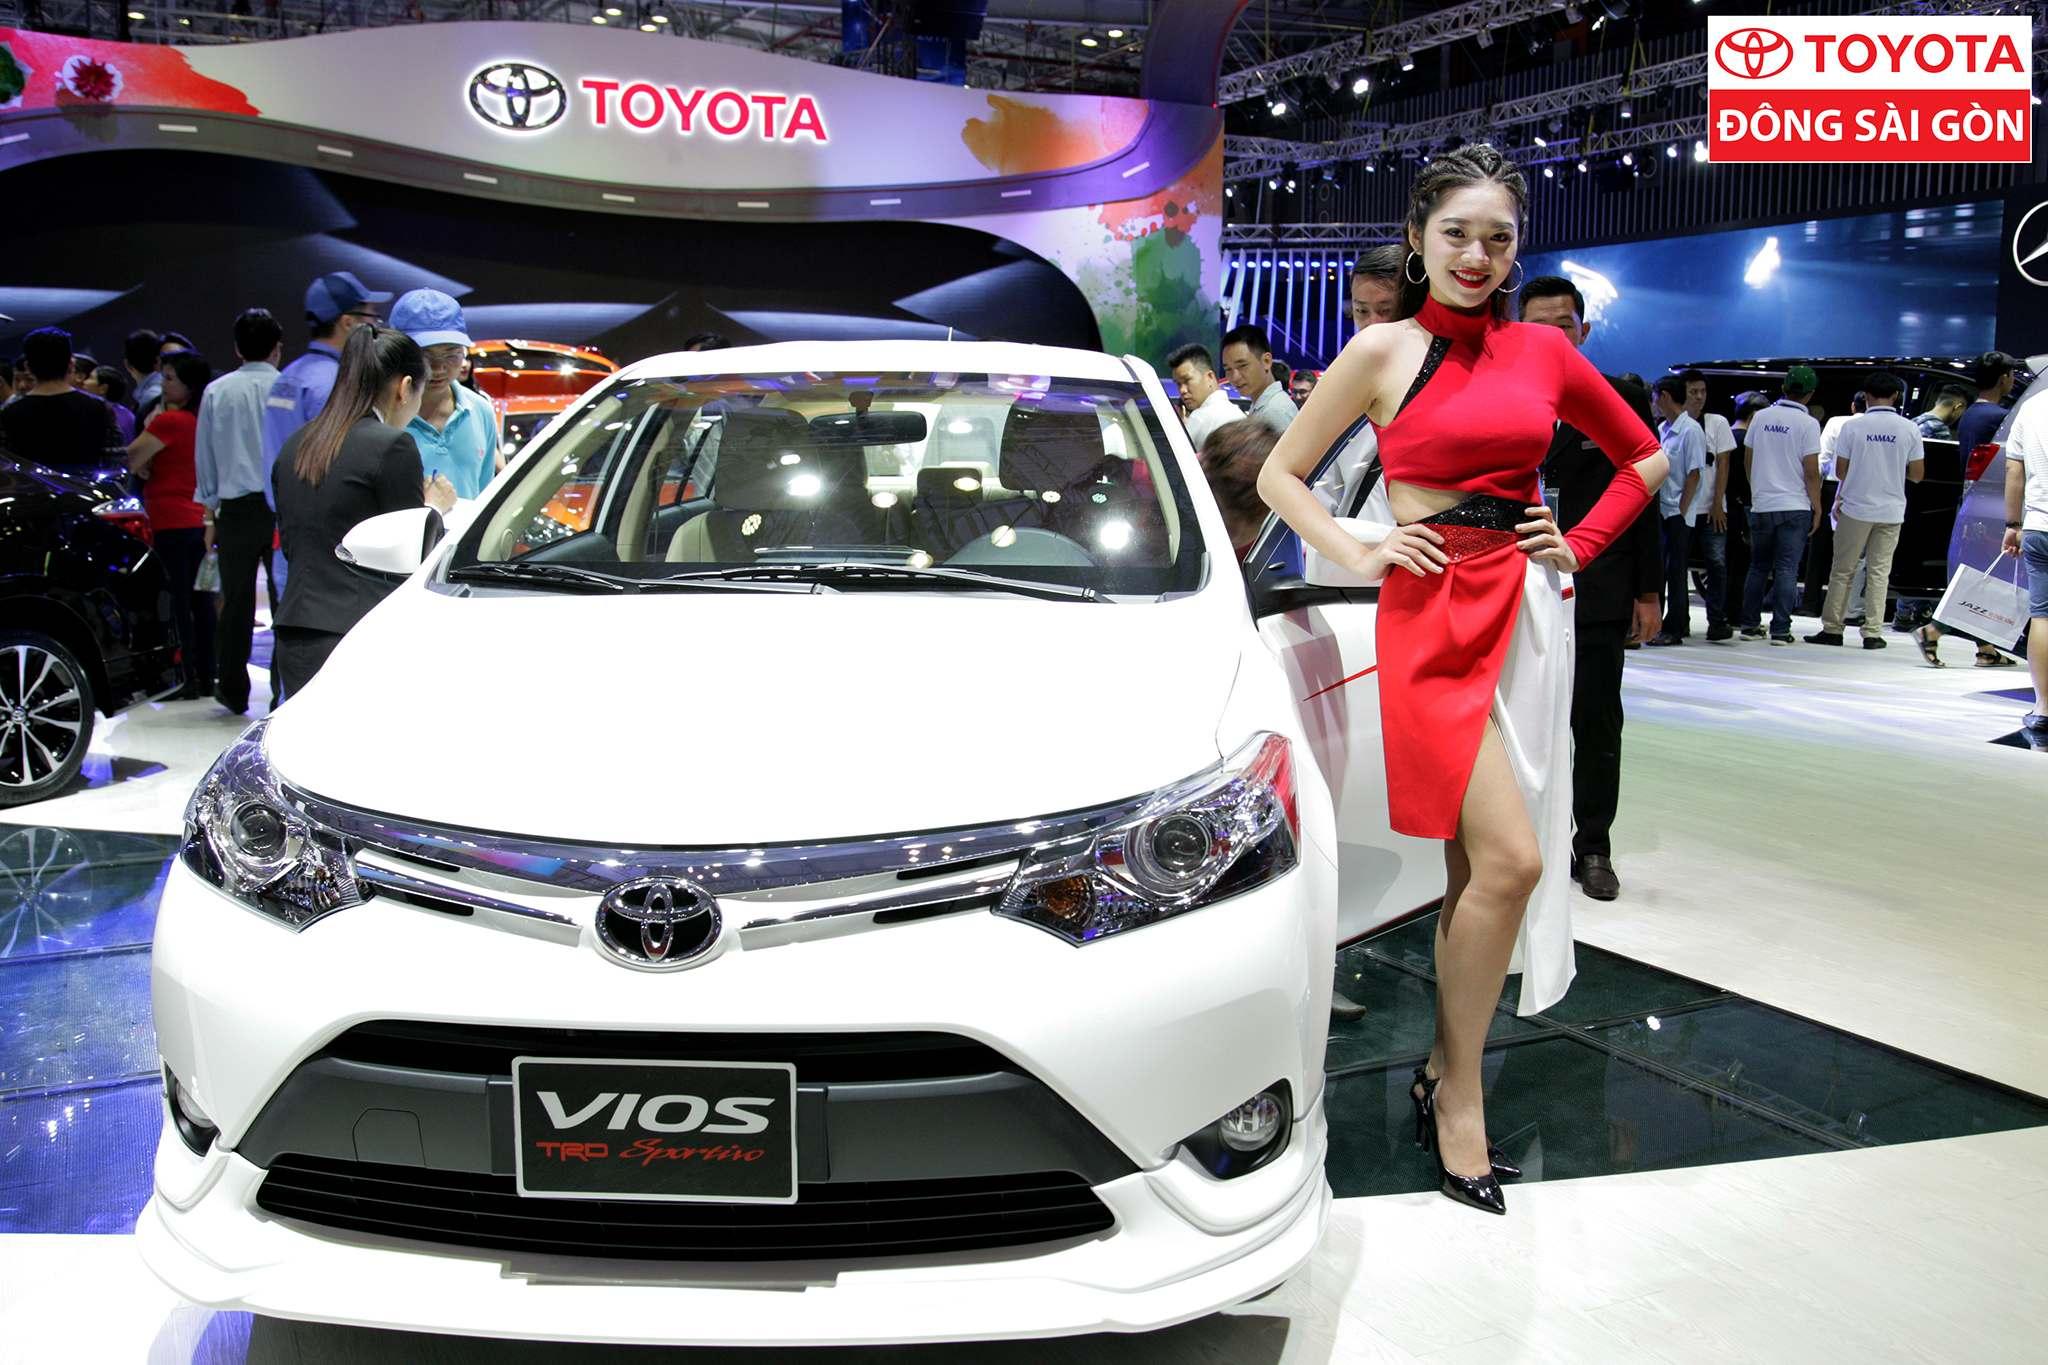 vietnam motor show 20176 Toyota at Vietnam Motor Show 2017